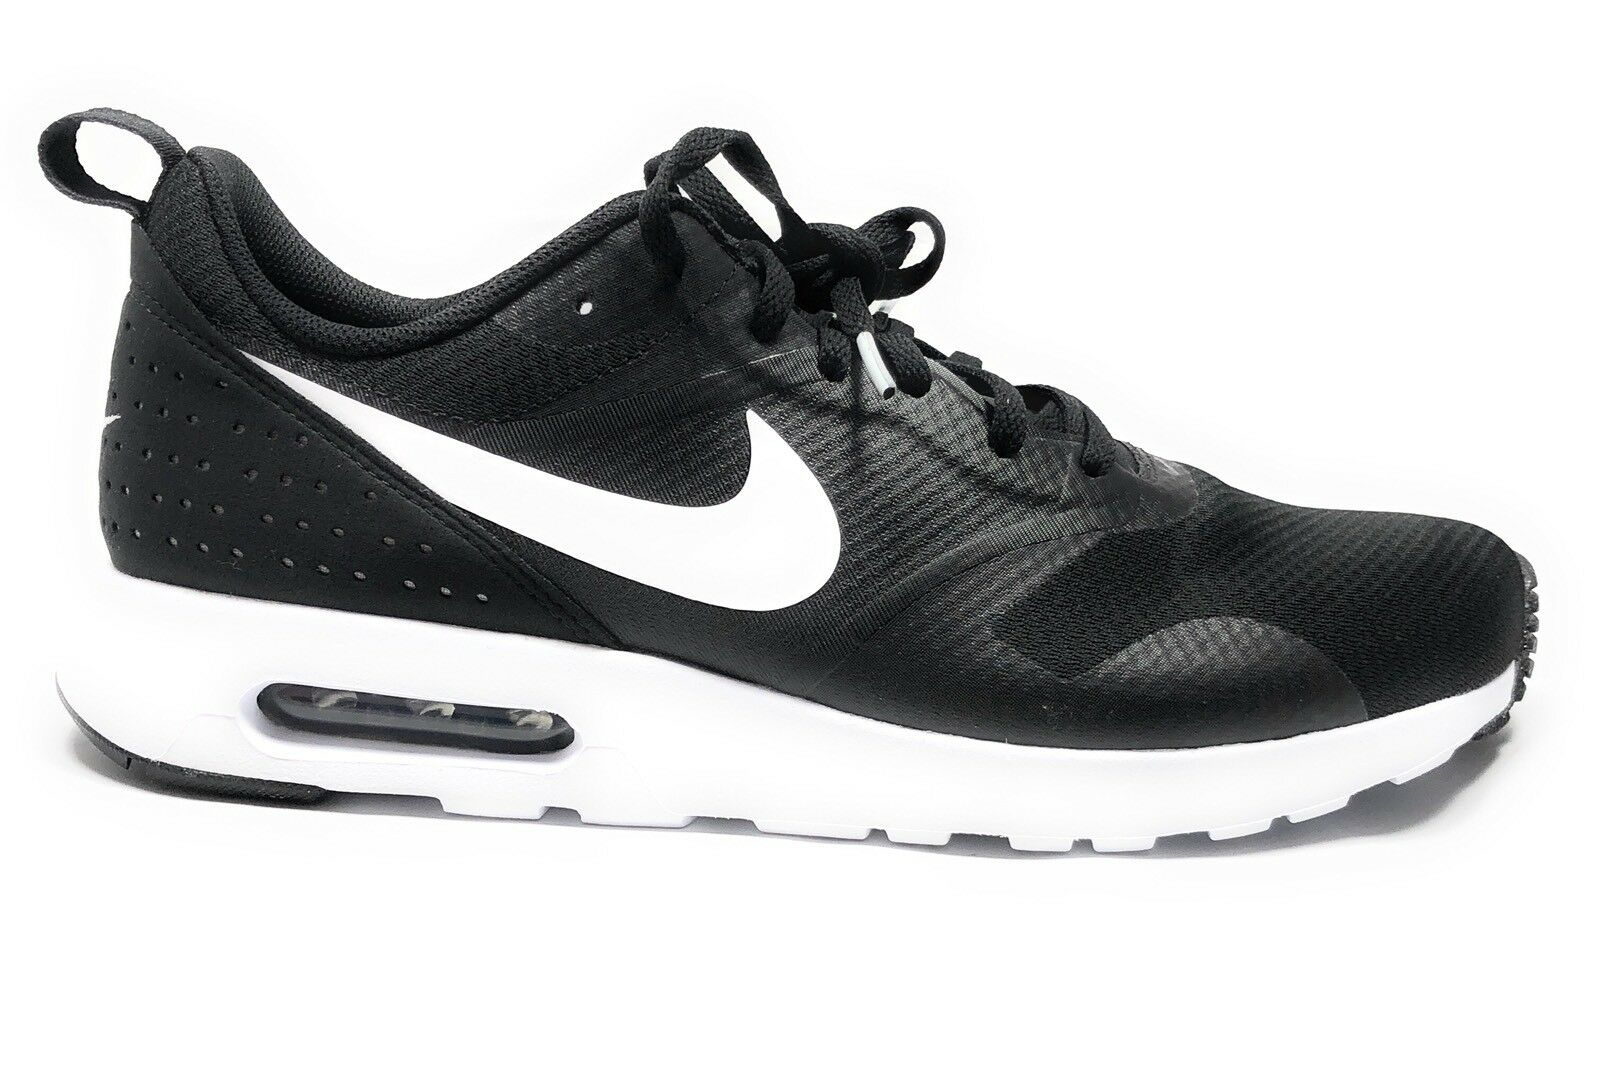 Men's NIKE Air Max Tavas RUNNING Shoes Size 11.5 Black / White (705149 009)